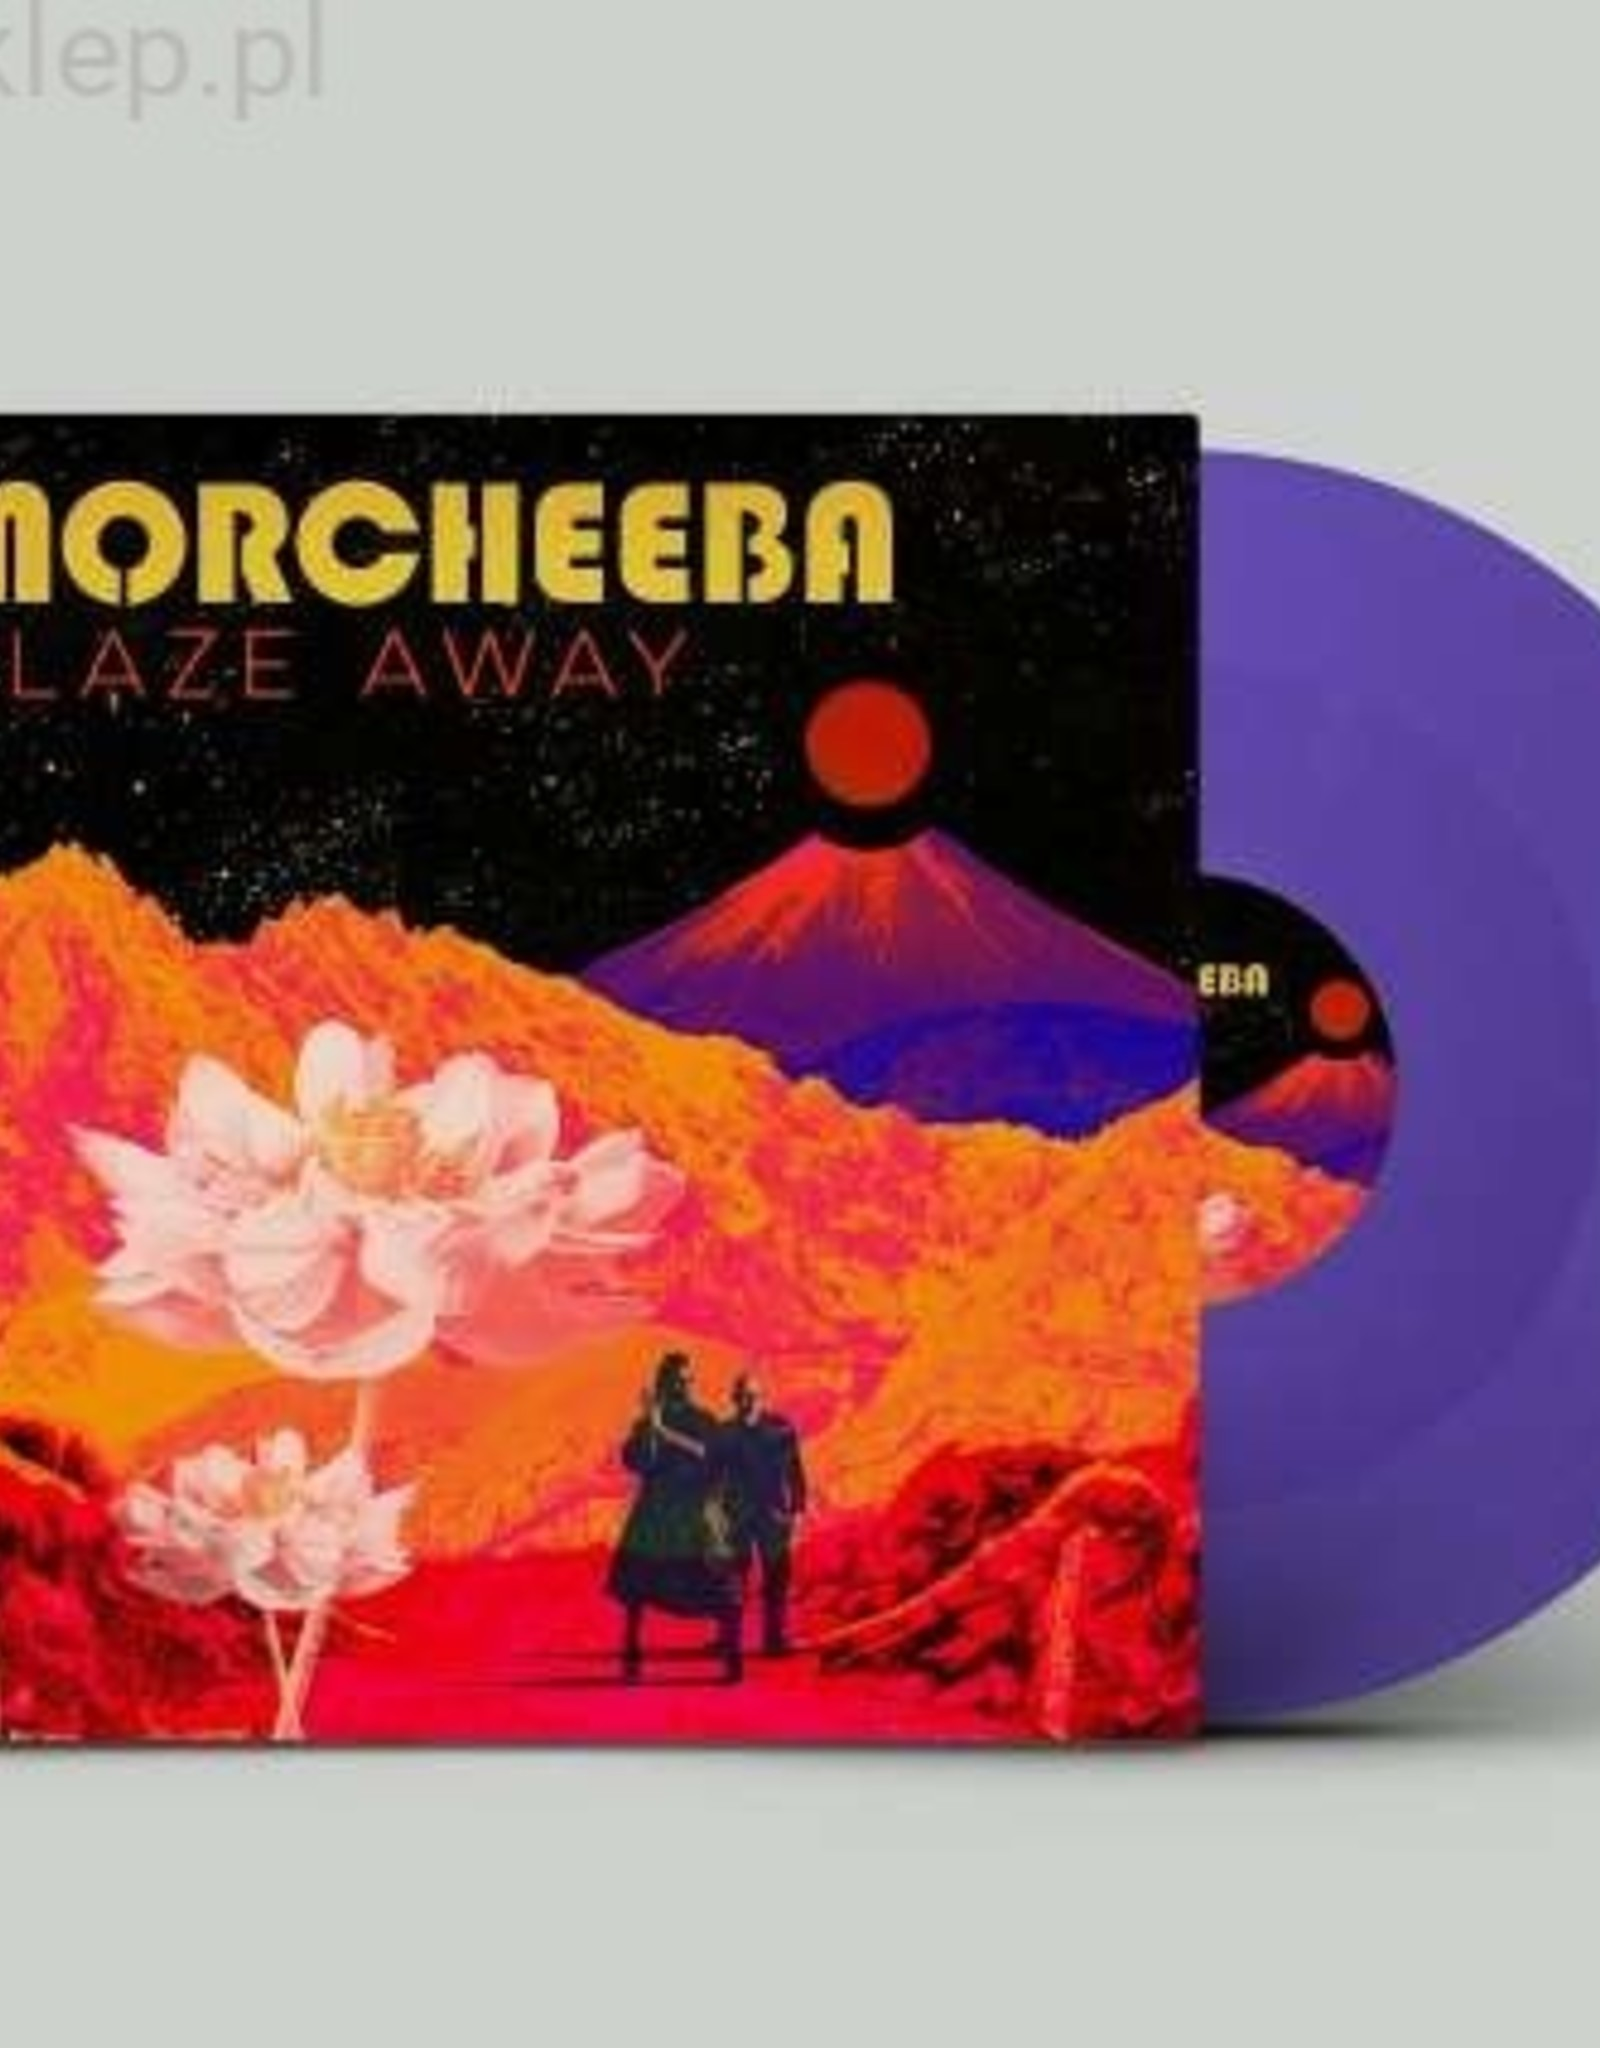 Morcheeba - Blaze Away (Lilac Vinyl) (Indie Only)